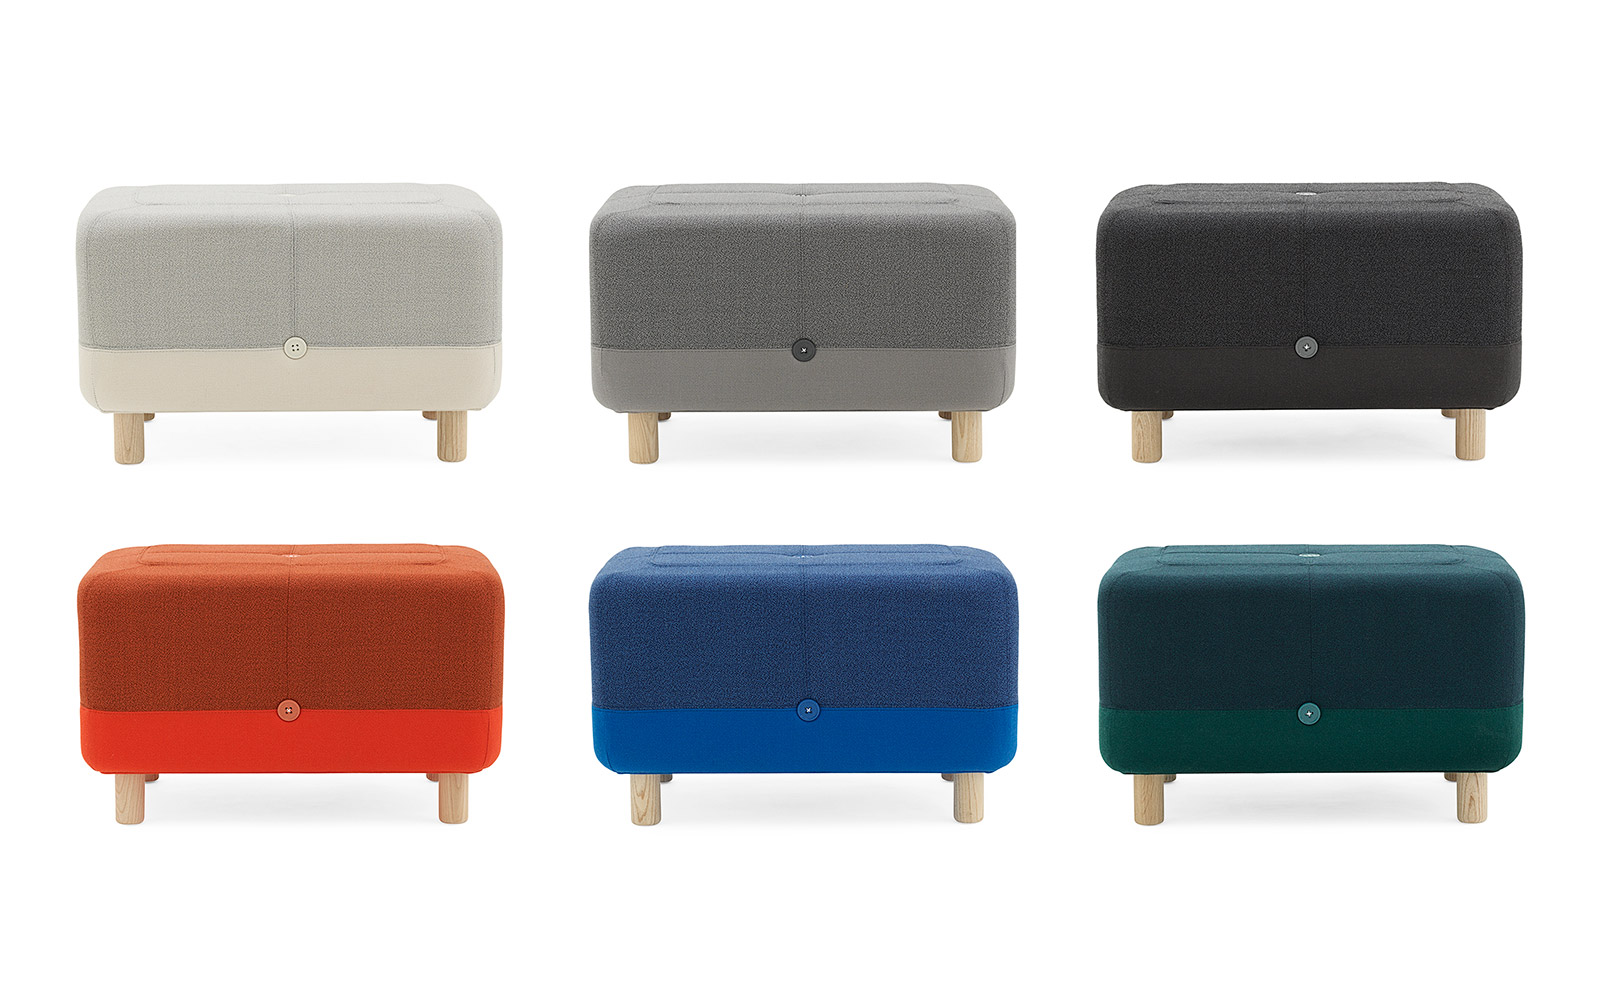 designer poufs footstools  poufs crowdyhouse designer  - designer poufs